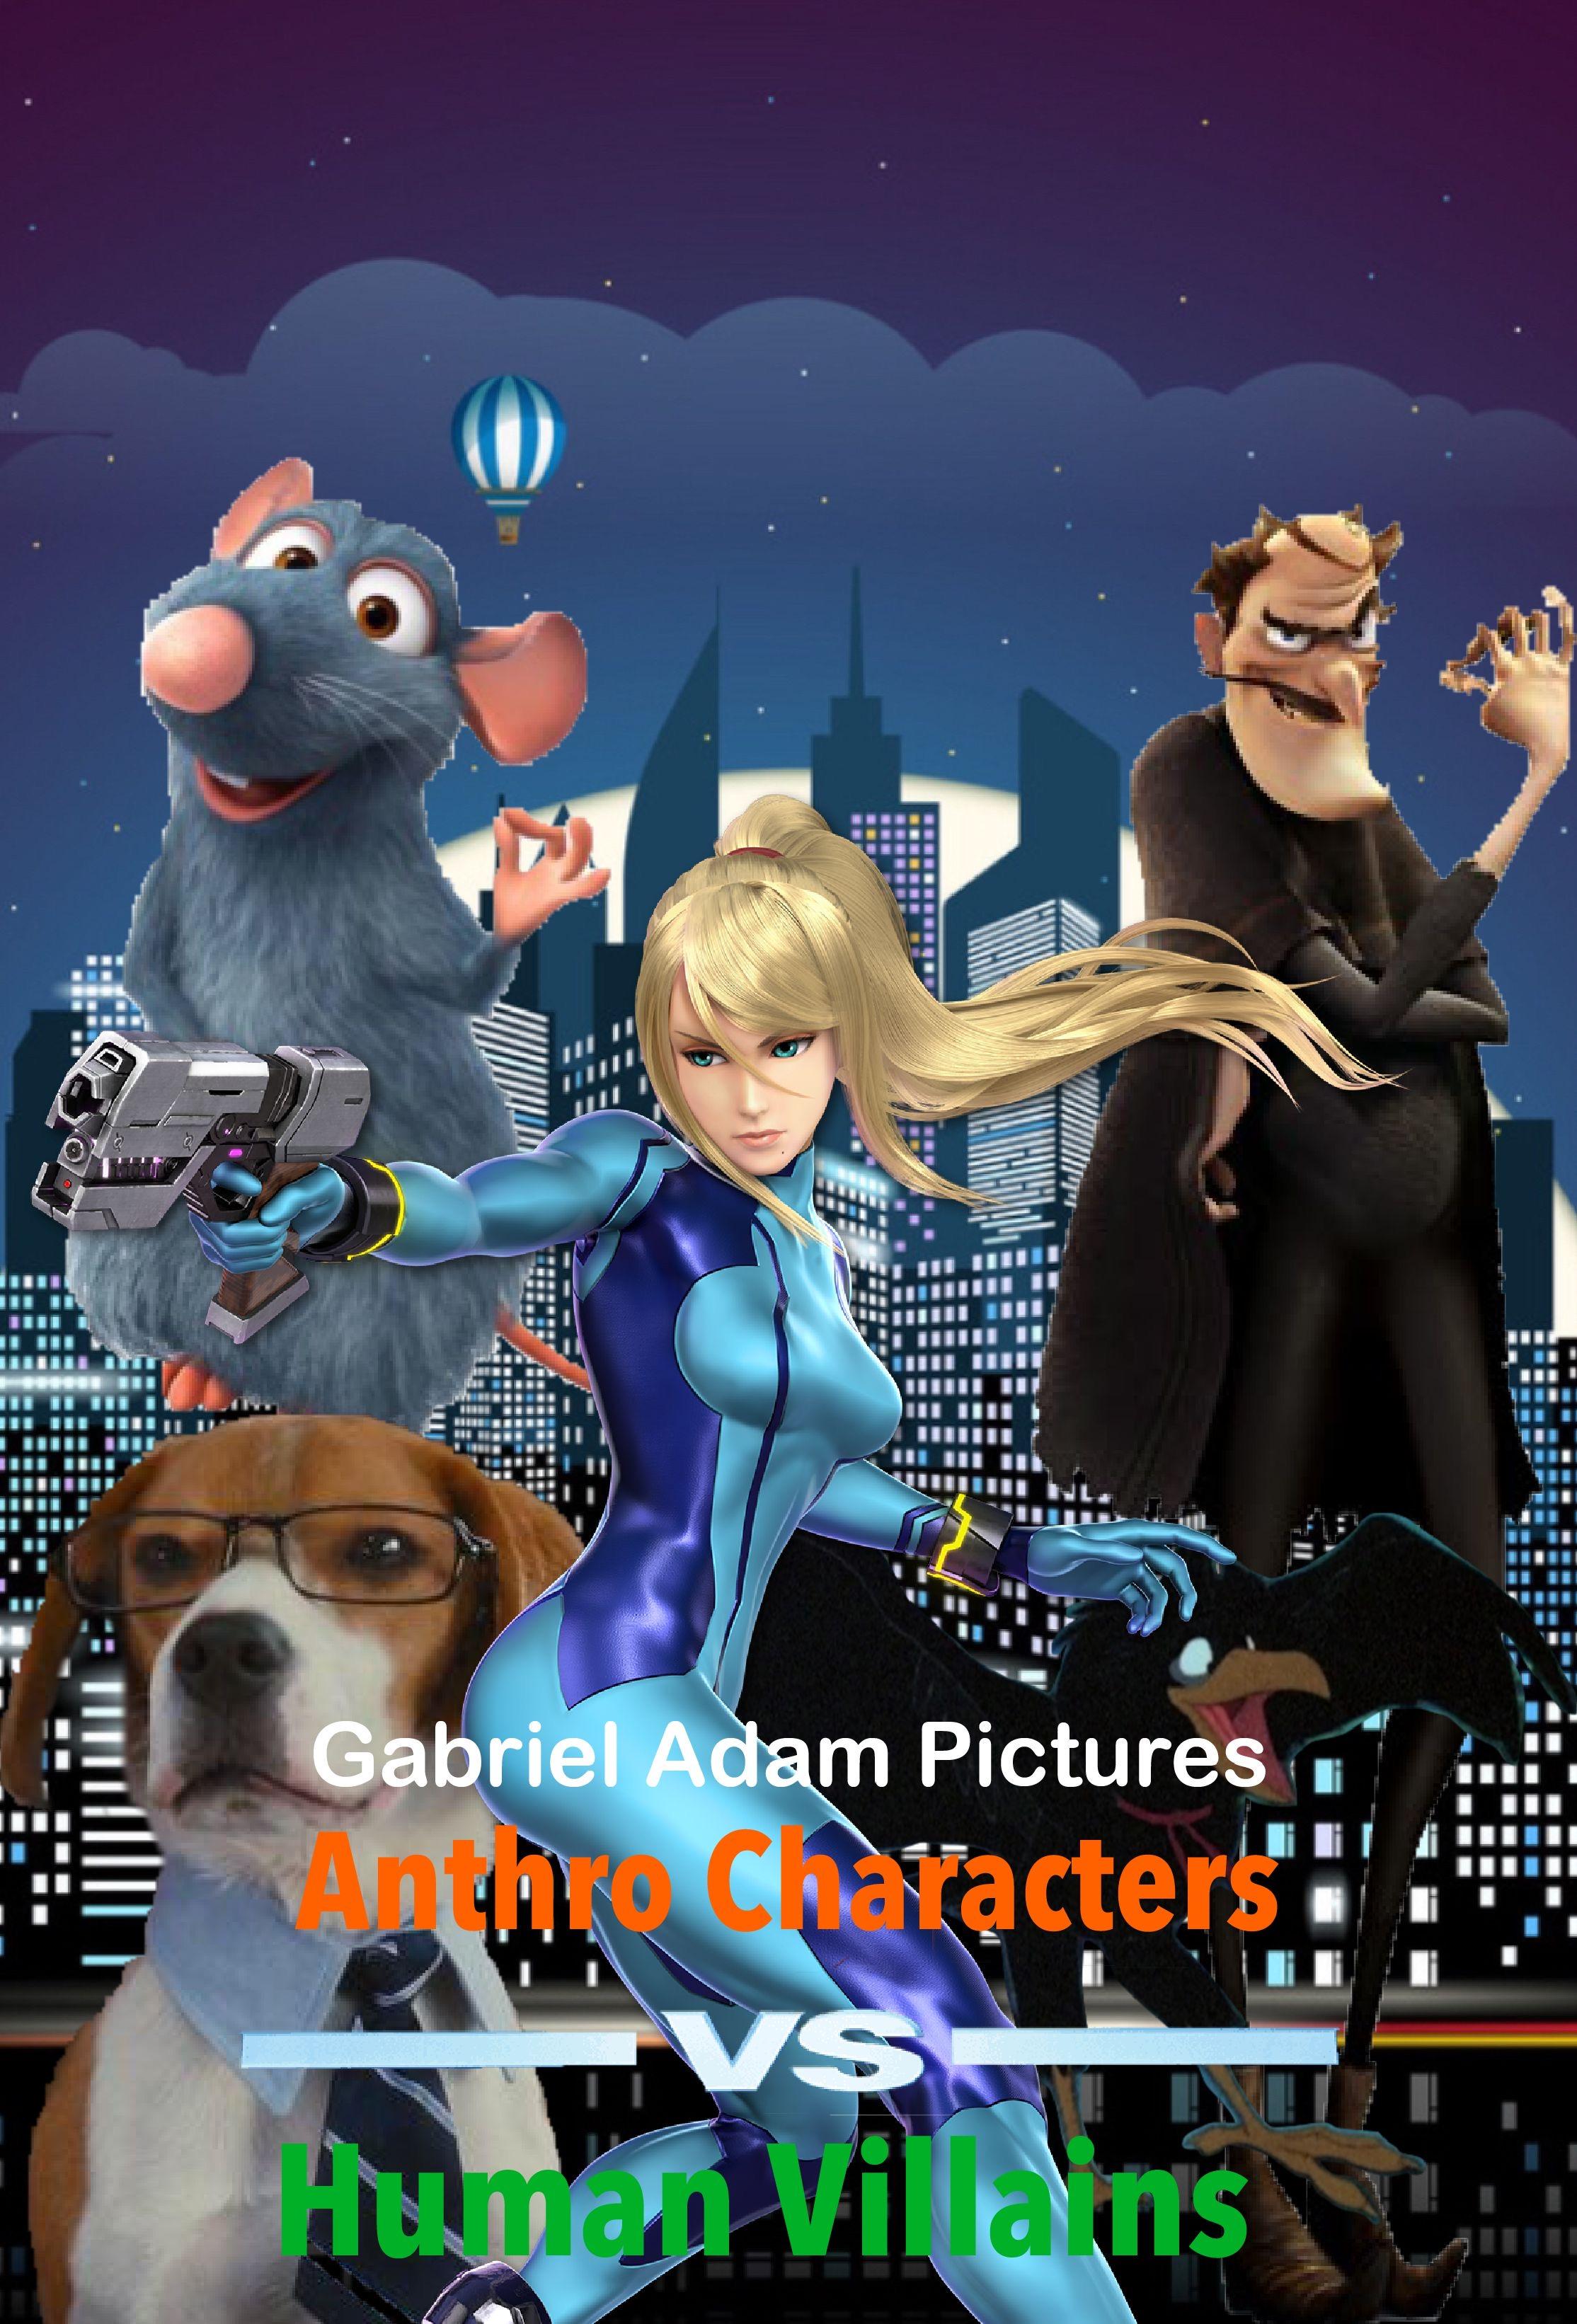 Anthro Characters VS. Human Villains (TV Series)